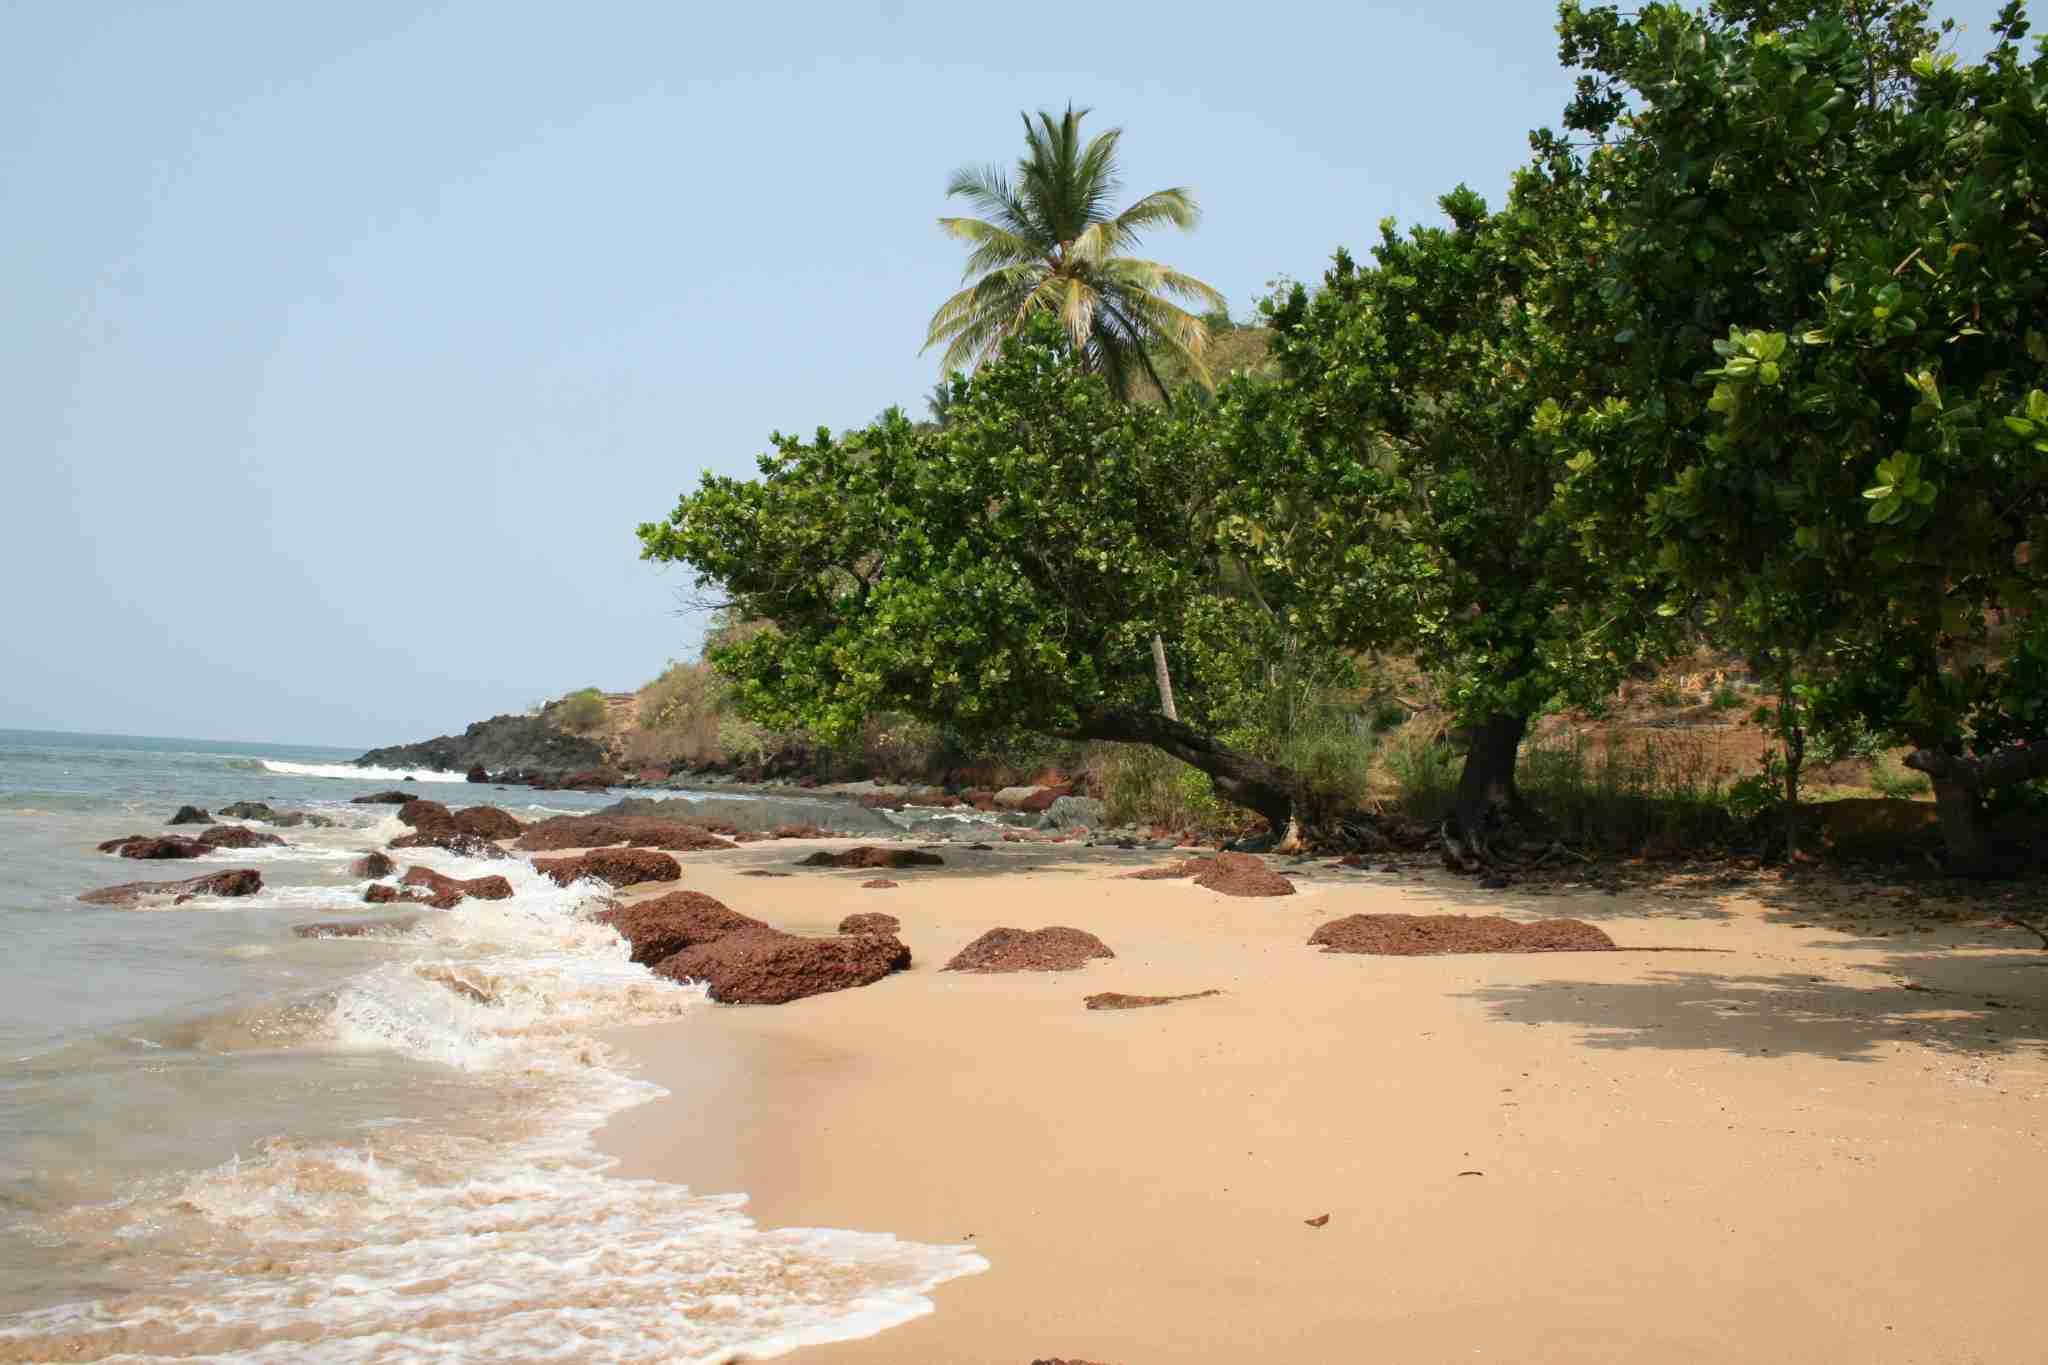 A beach in Goa, India. Photo by Lori Zaino/The Points Guy.